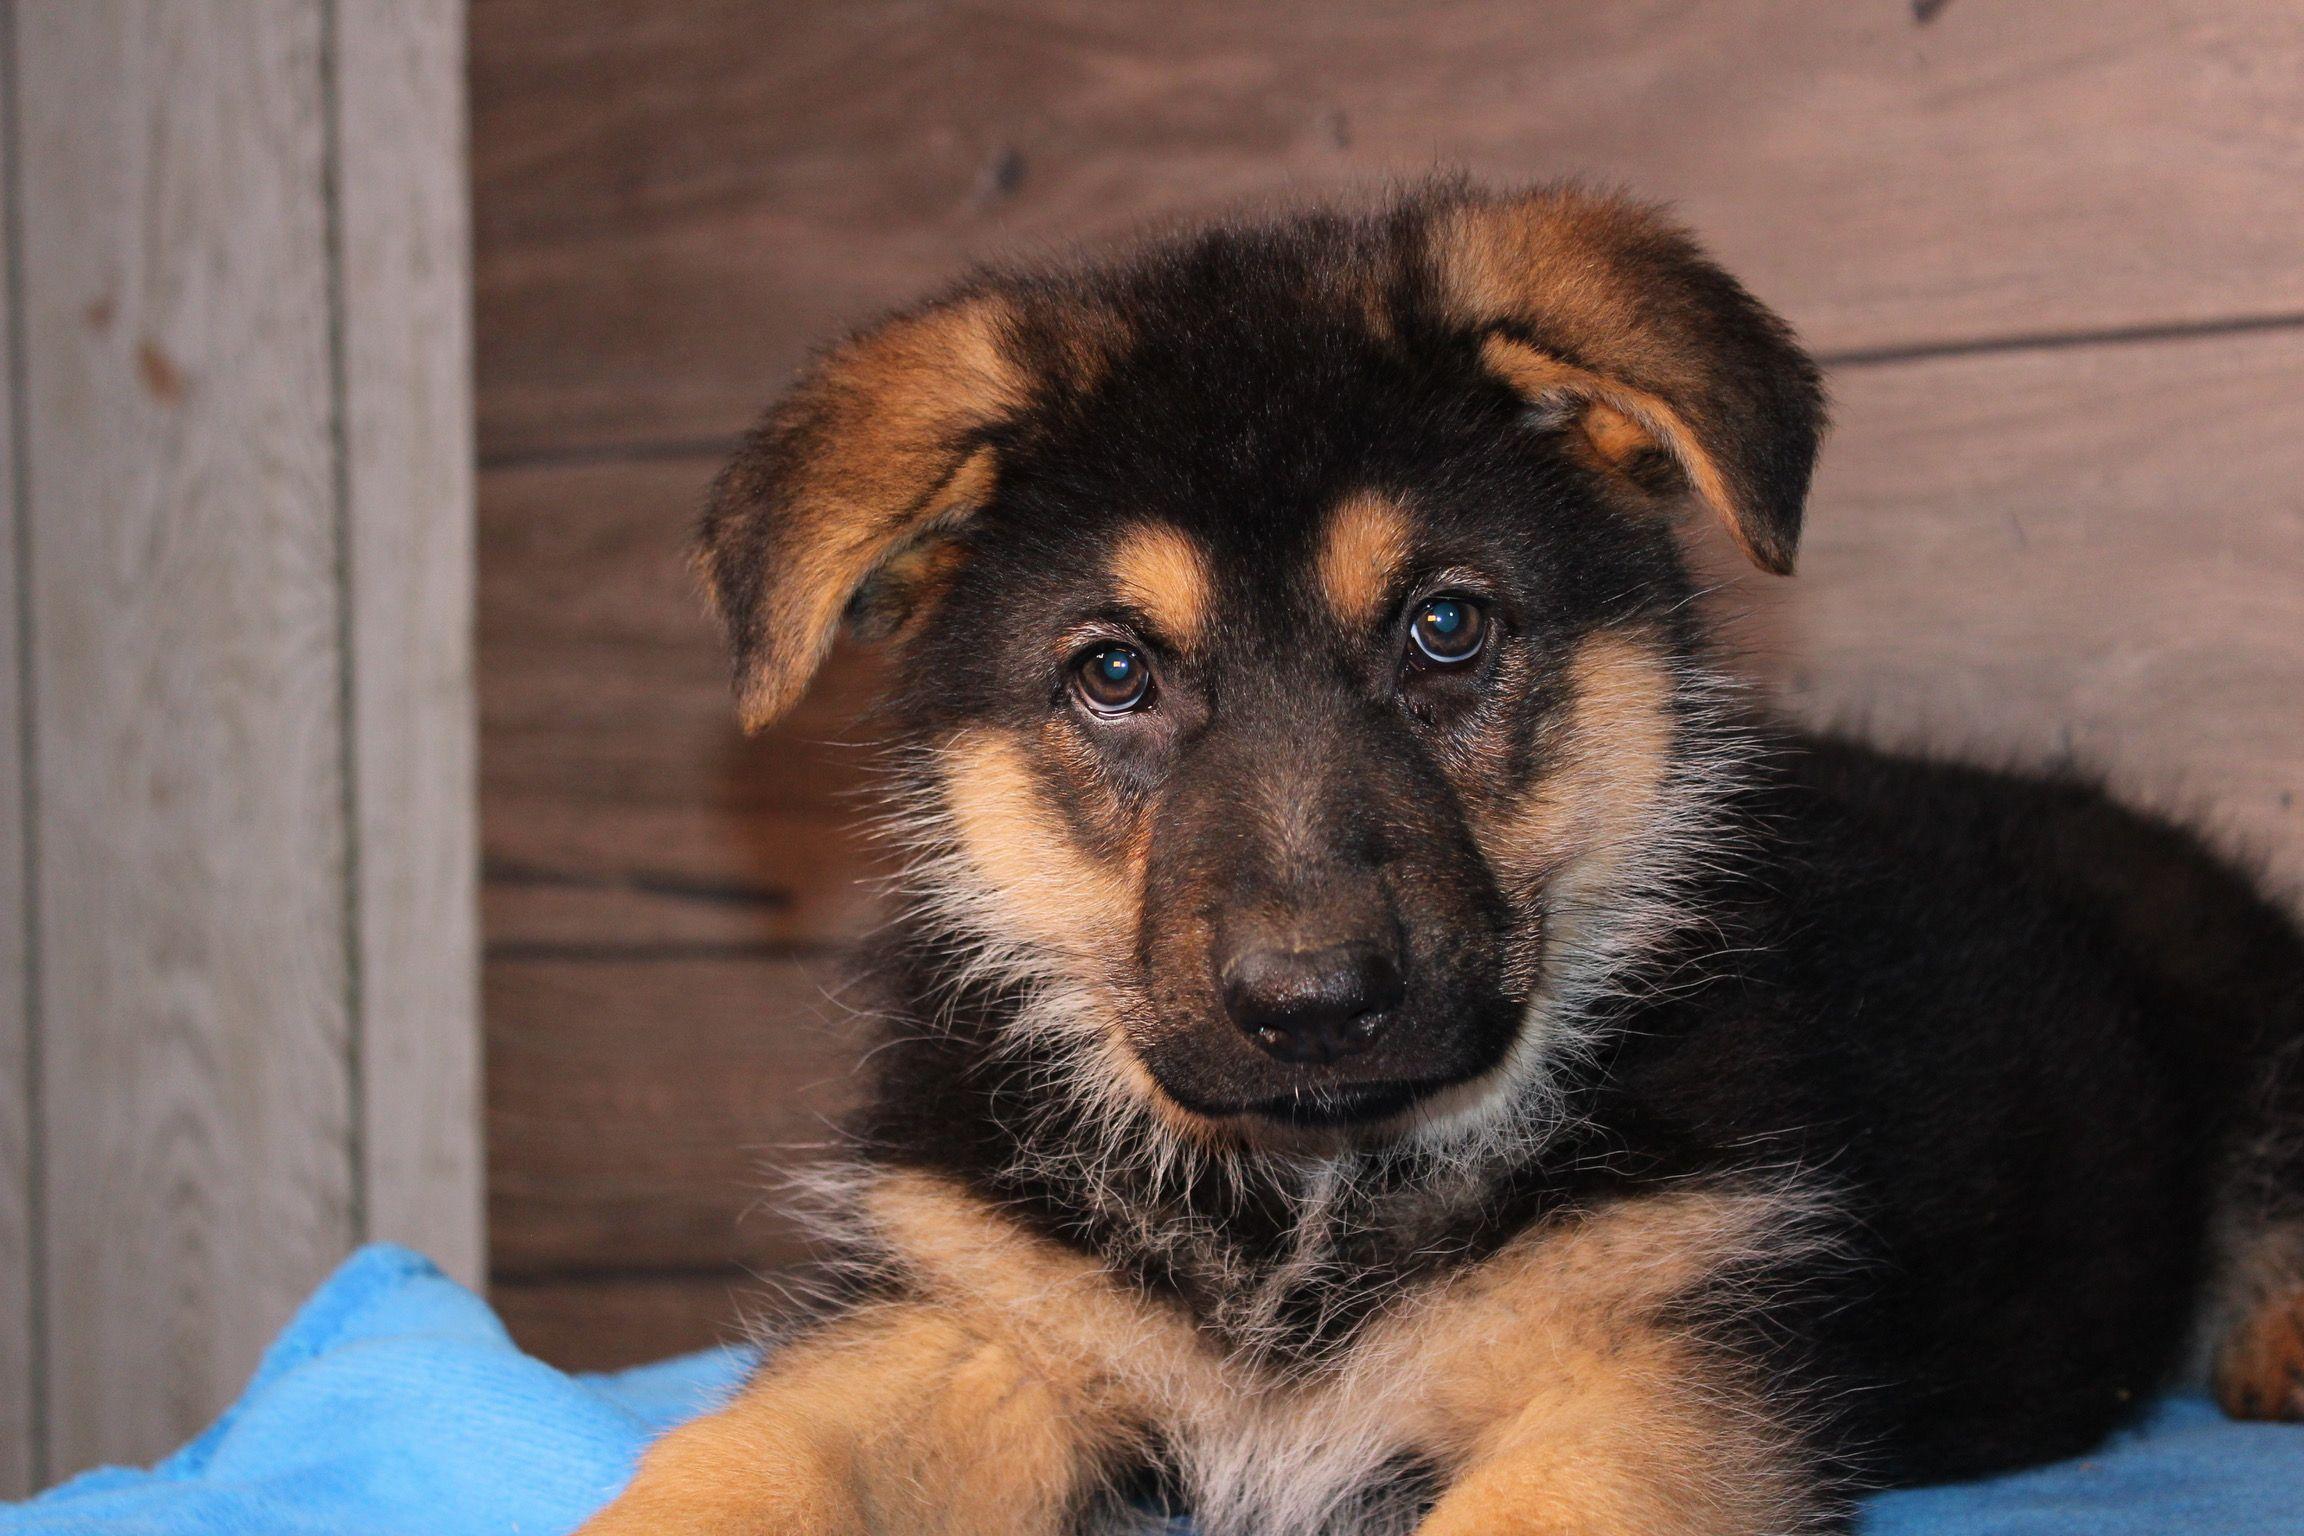 Samson A Male Akc German Shepherd Puppy For Sale In Nappanee Indiana Find Cute German Shepherd Puppies And Resp German Shepherd Dogs Bulldog Breeds Puppies